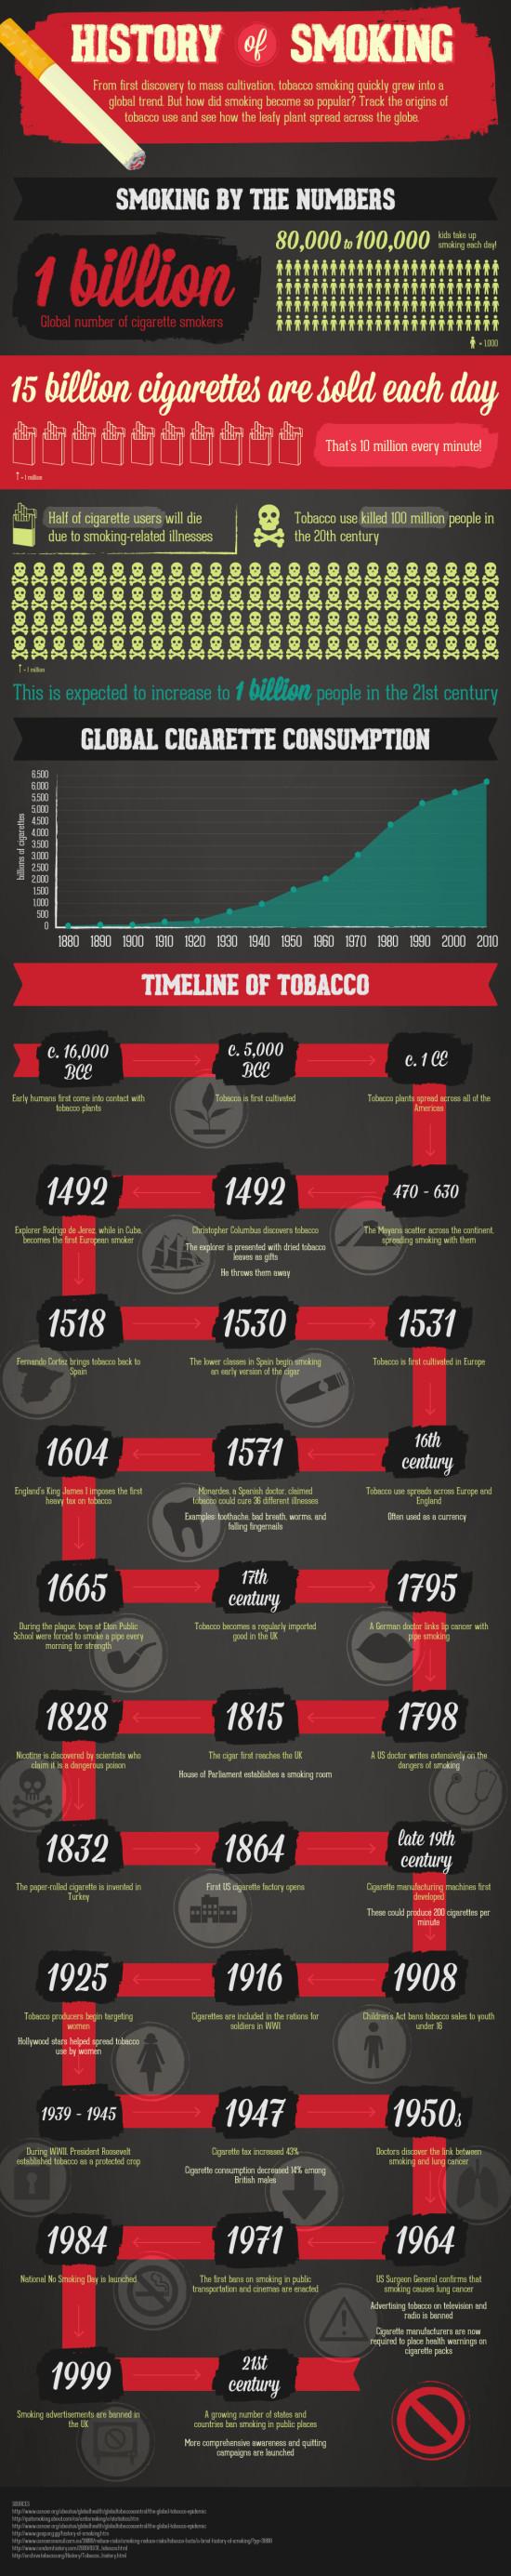 History of Smoking